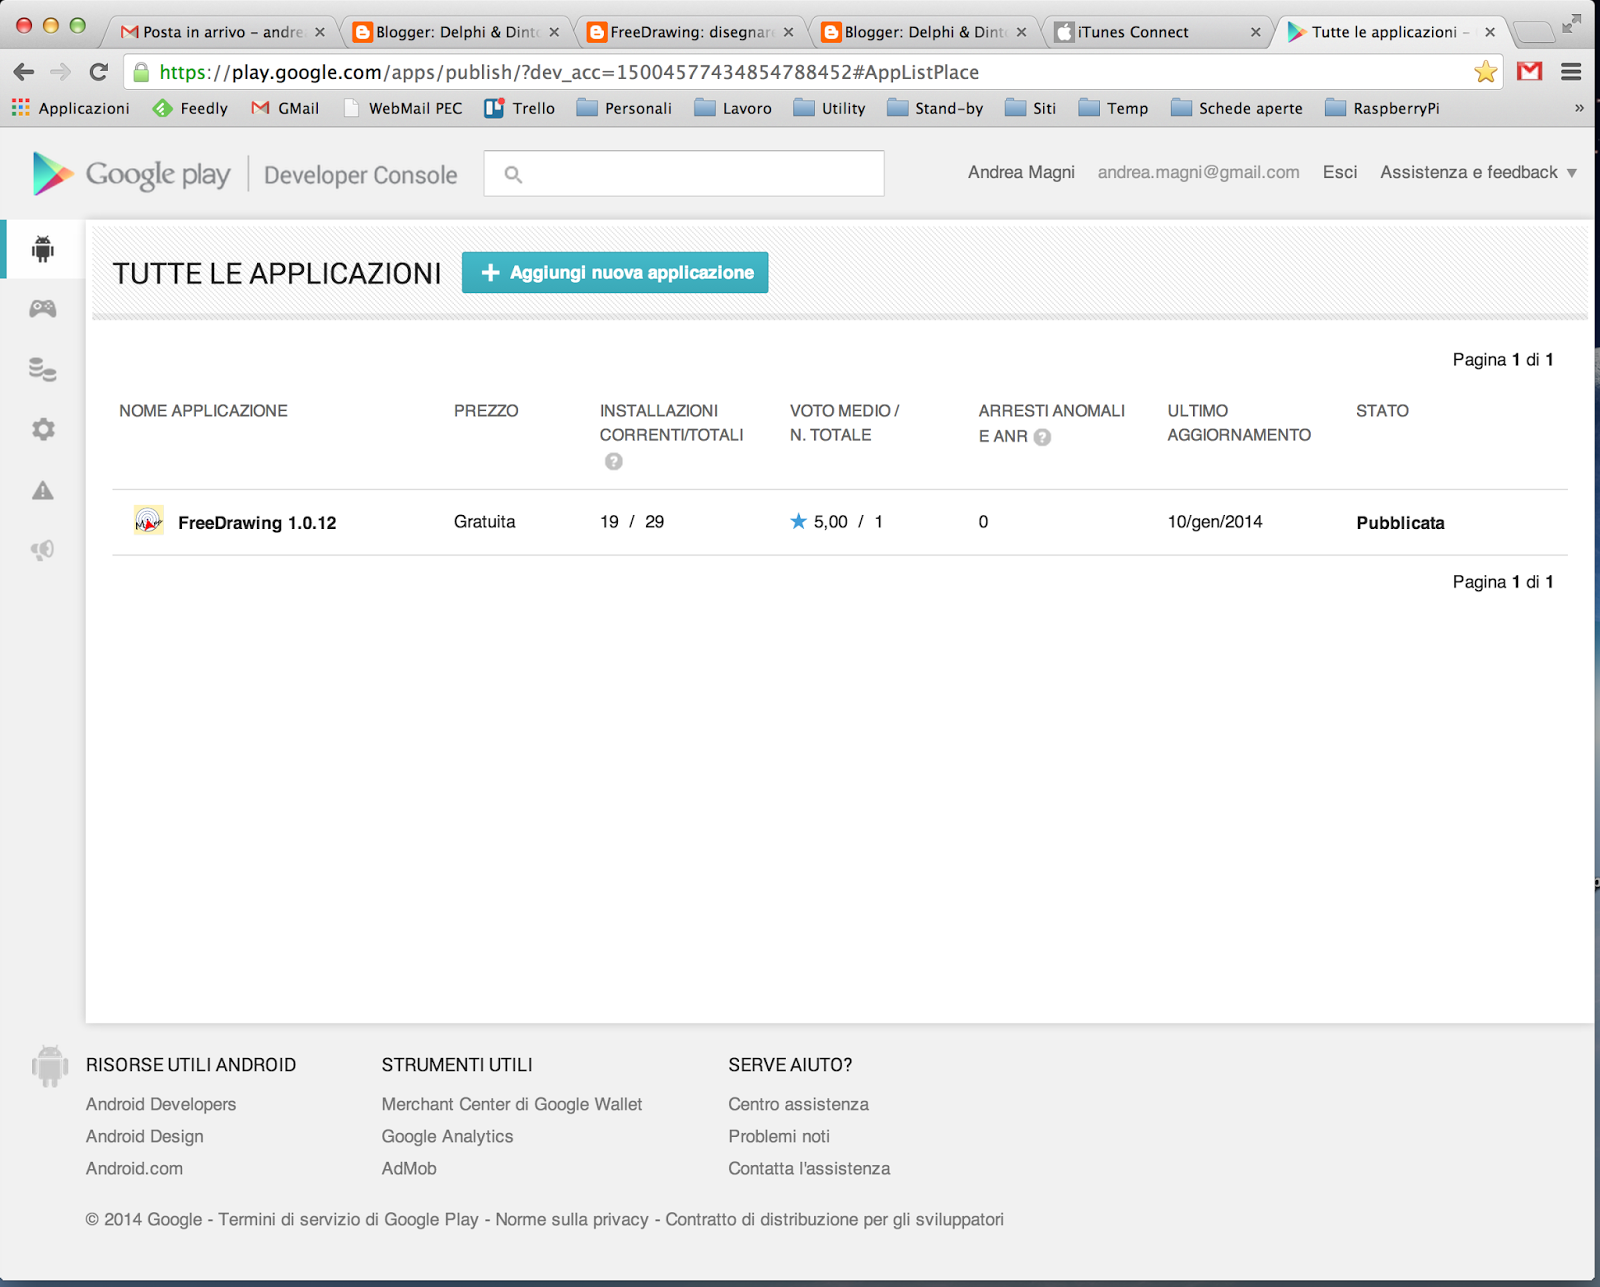 Delphi dintorni blog gennaio 2014 - Google developer console ...